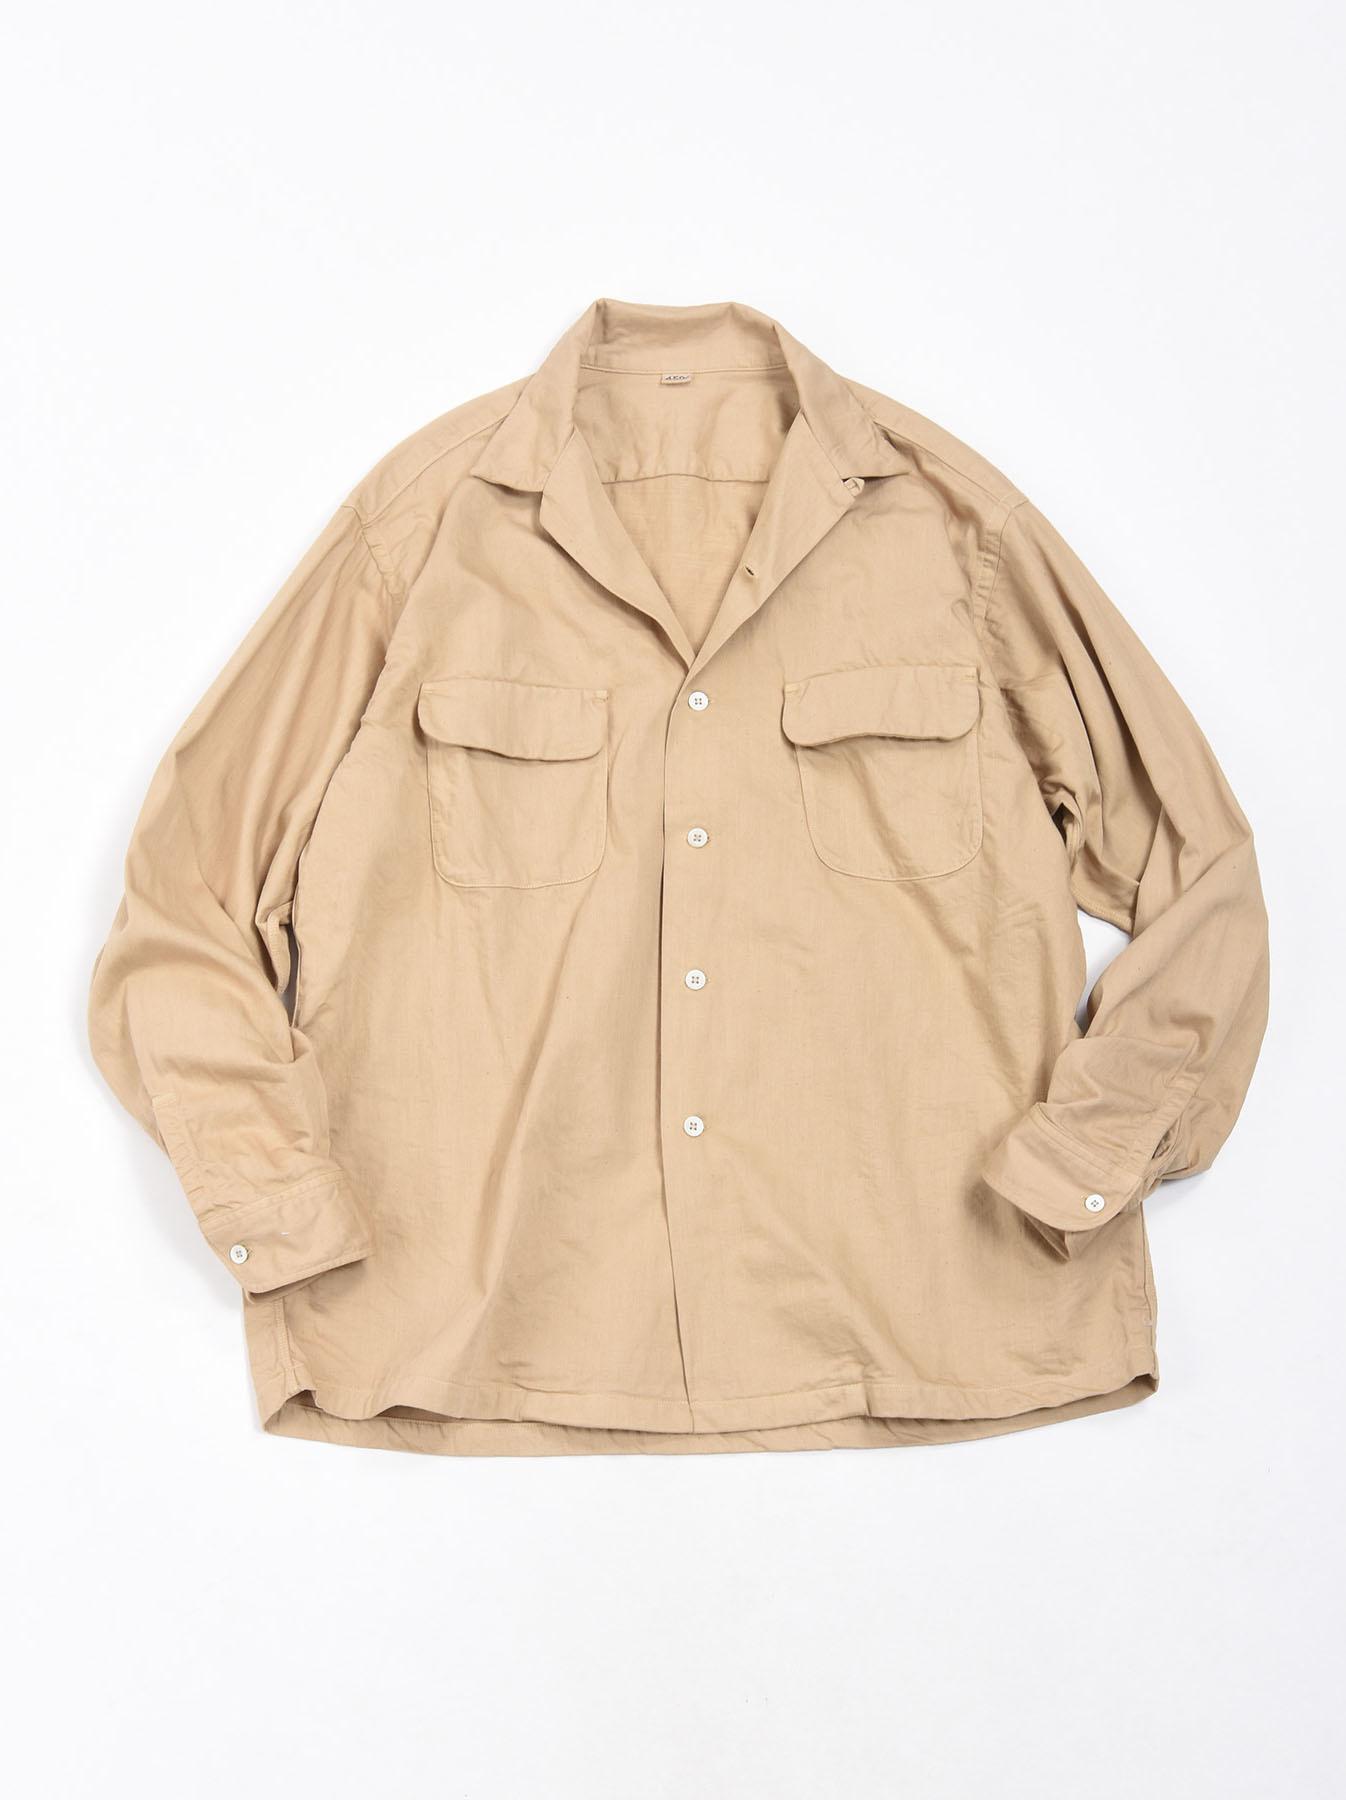 Goma Chino Aloha Shirt-6